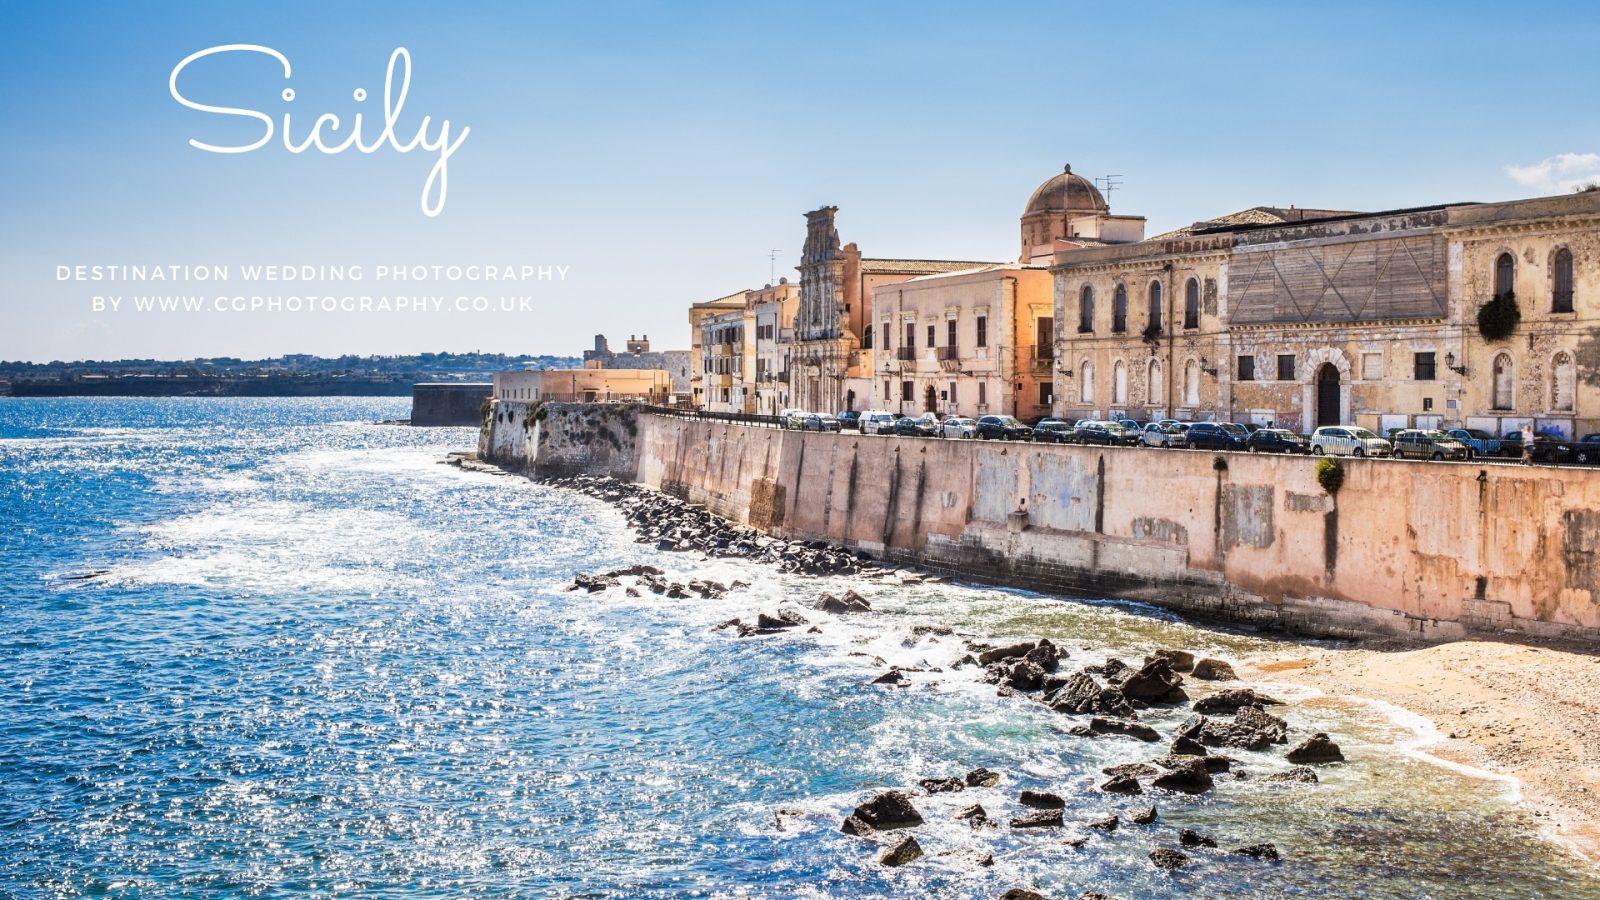 Beach Wedding in Sicily